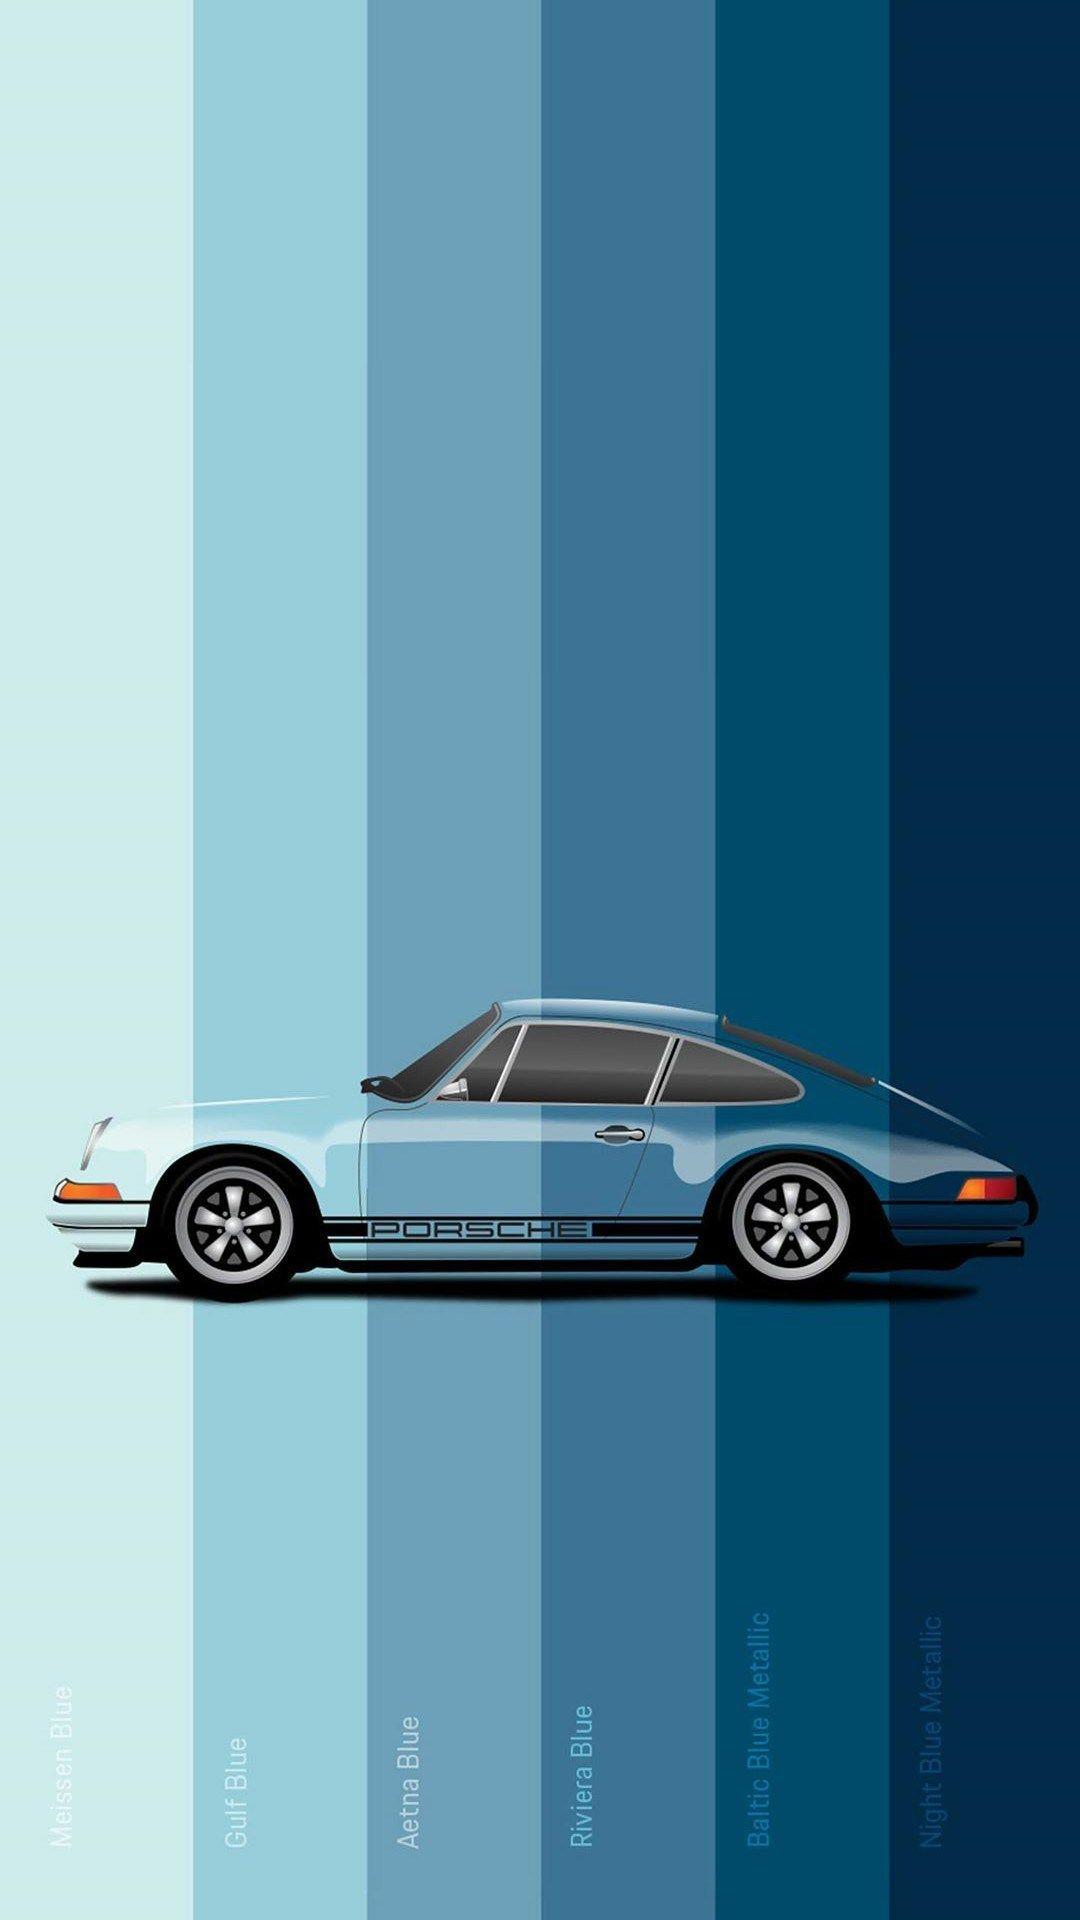 Blue Porsche Samsung Galaxy Note 4k Wallpapers Traxzee In 2021 Porsche Wallpaper Car Wallpapers Porsche